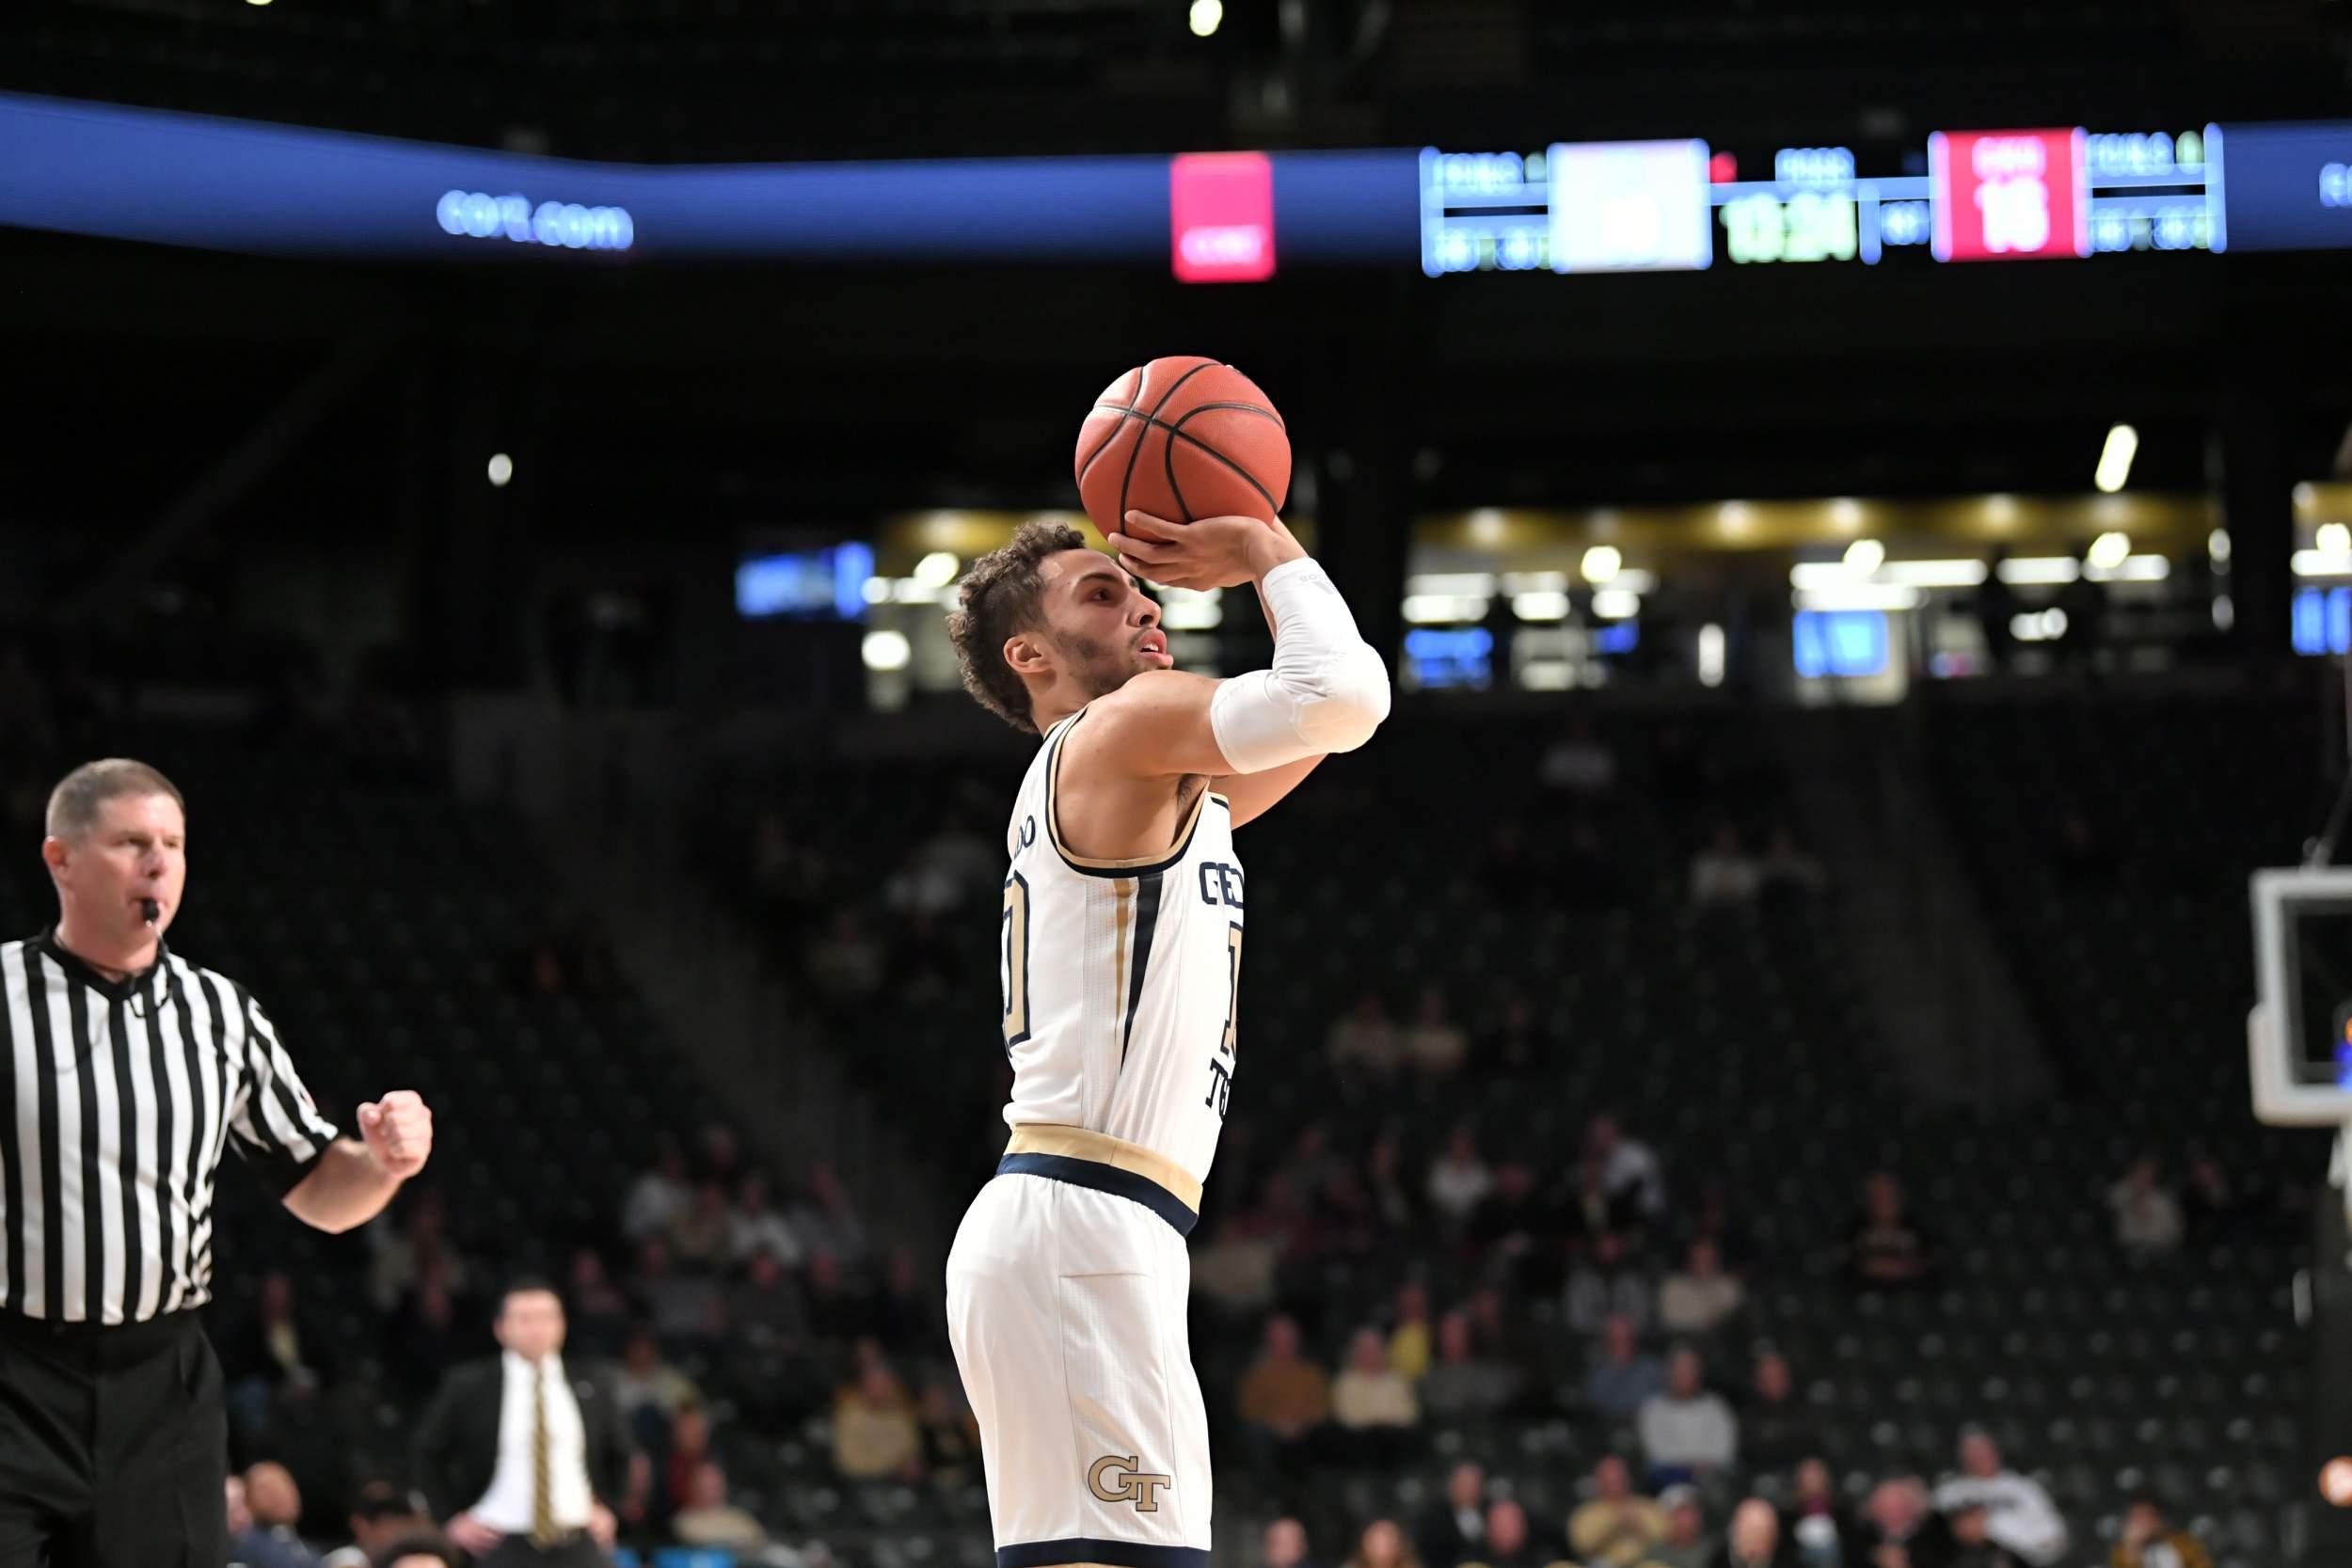 gardner-webb outlasts georgia tech, 79-69 – men's basketball